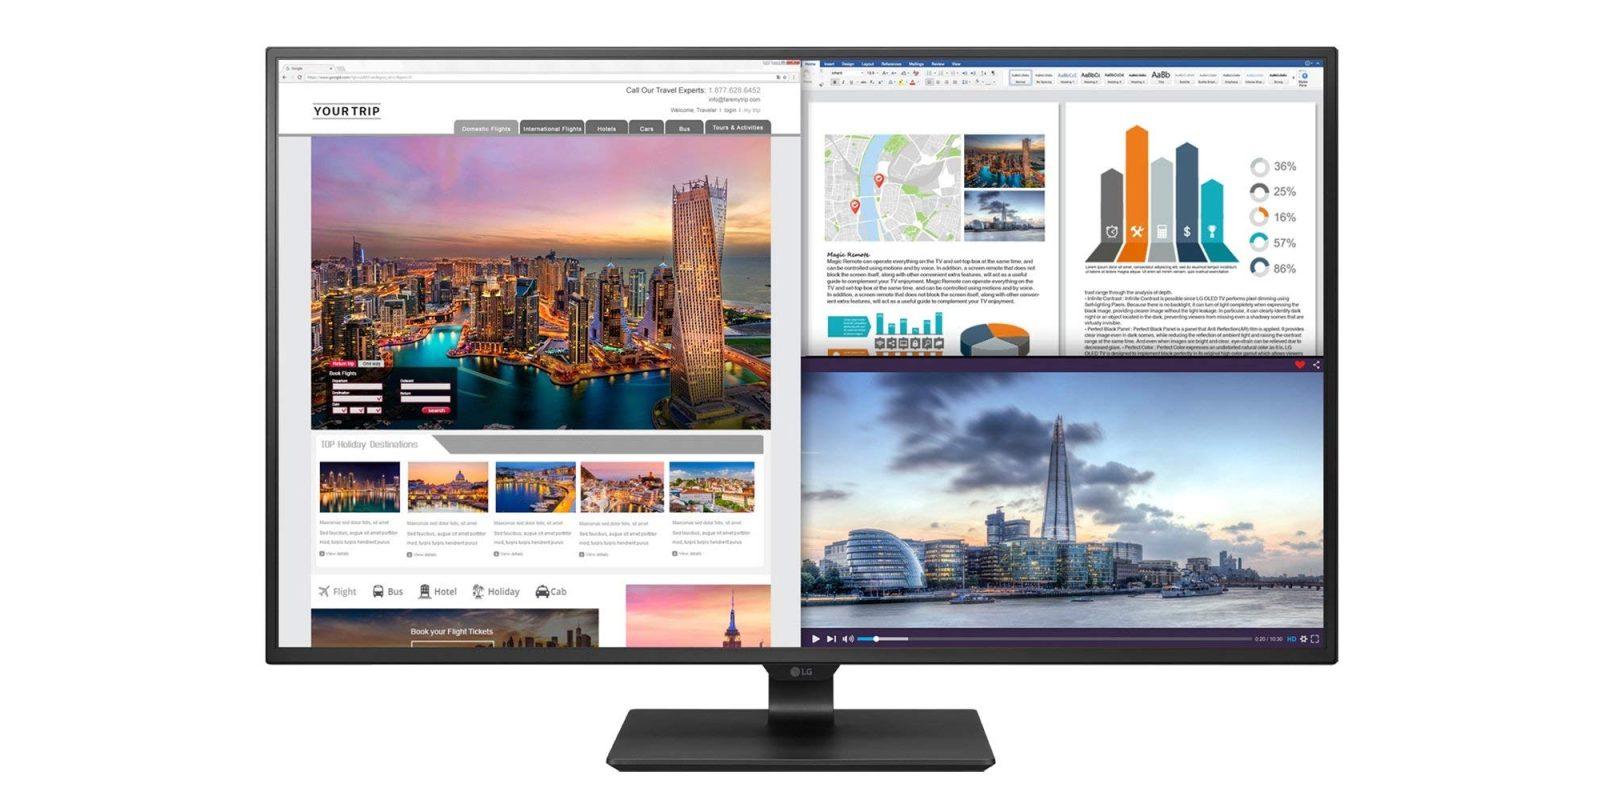 LG's 43-inch 4K UHD Monitor has USB-C and plenty of screen real